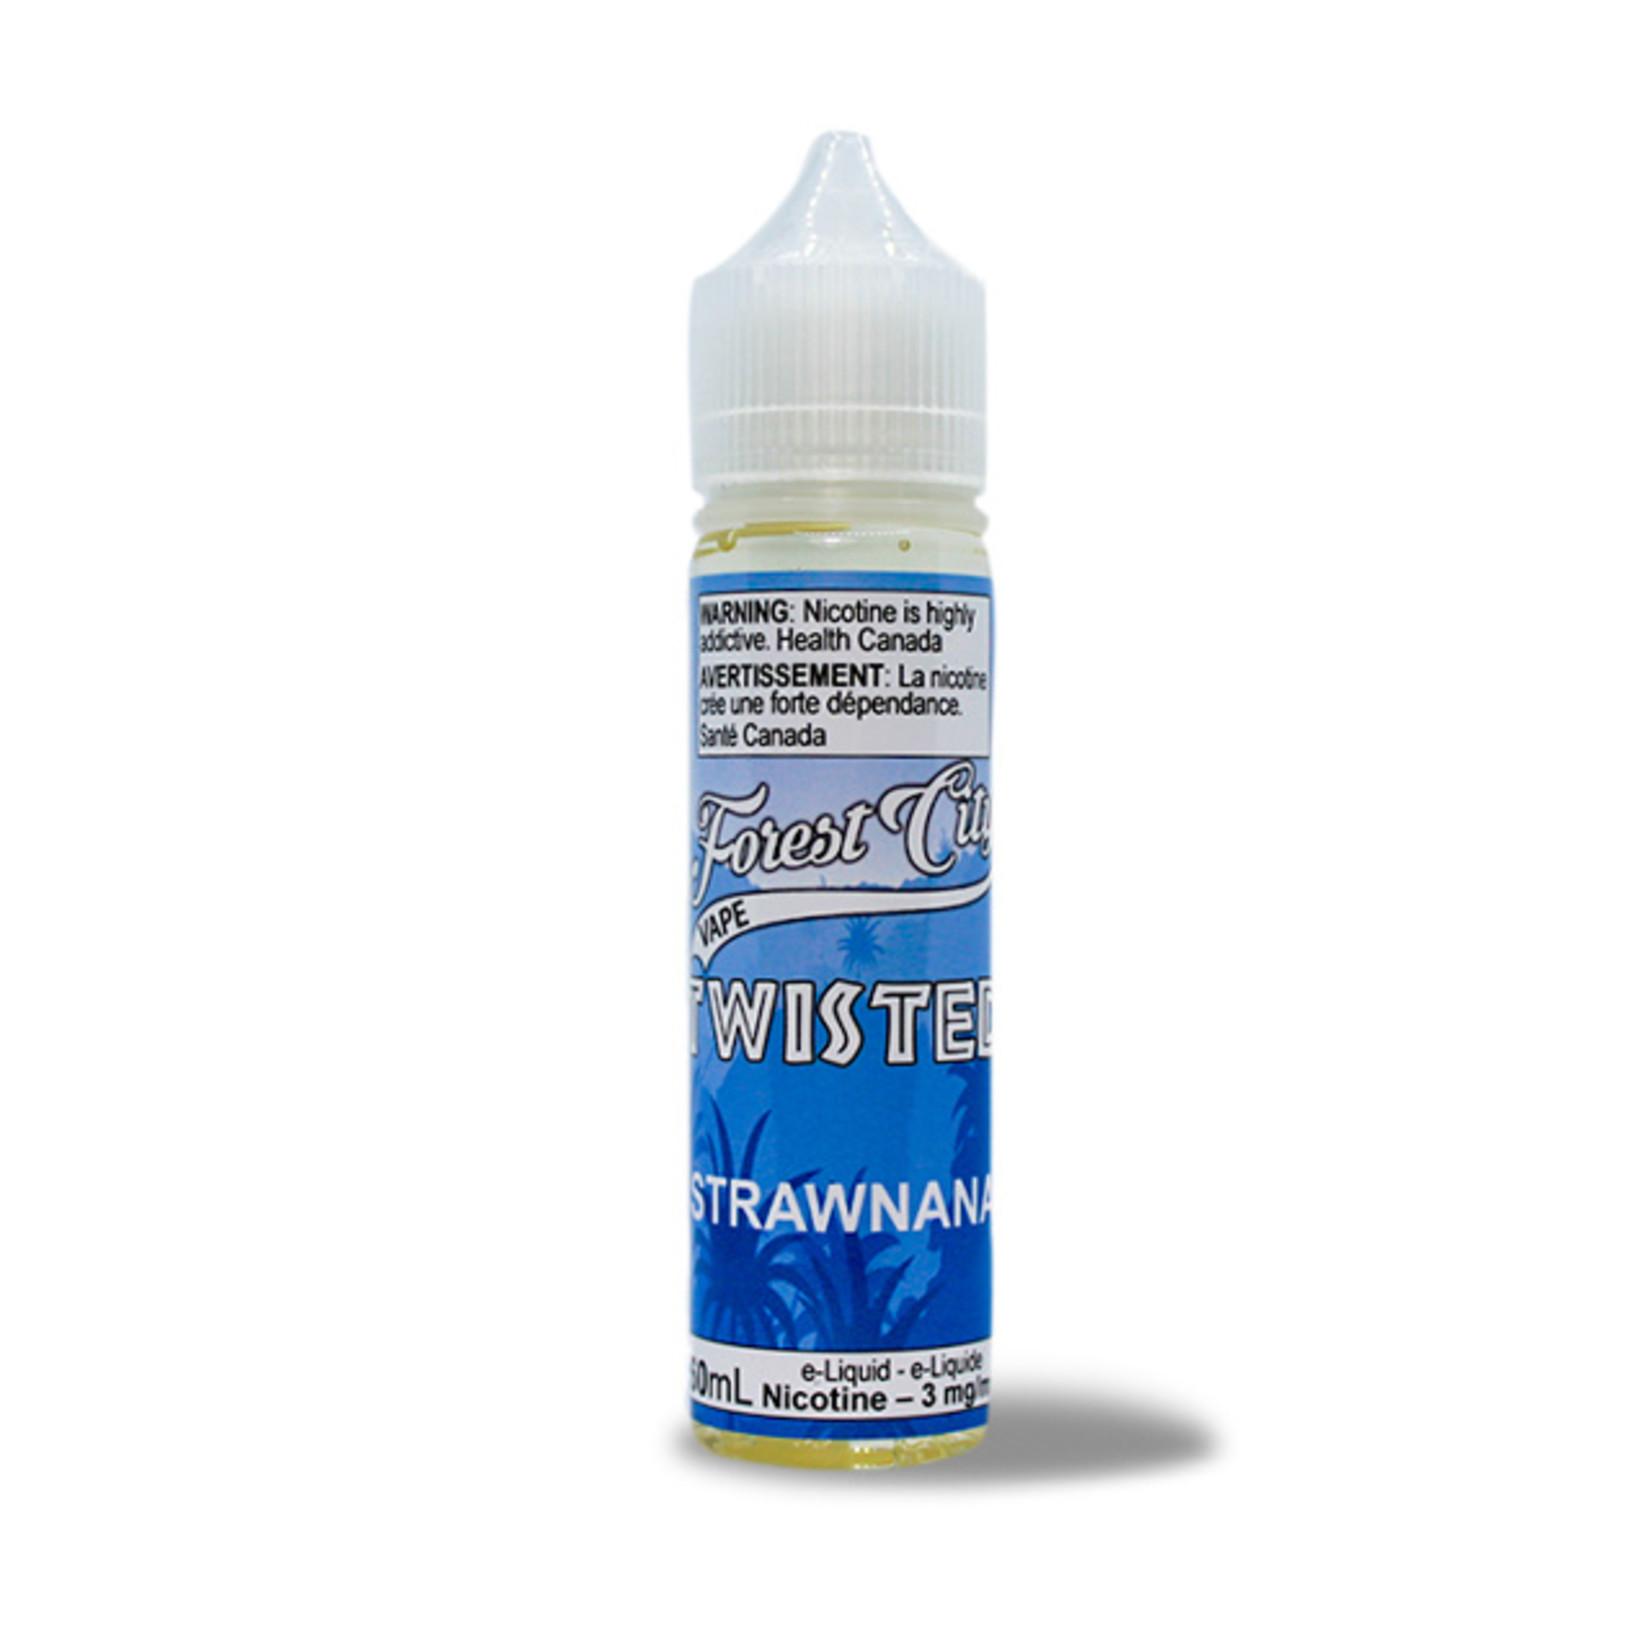 Twisted Strawnana